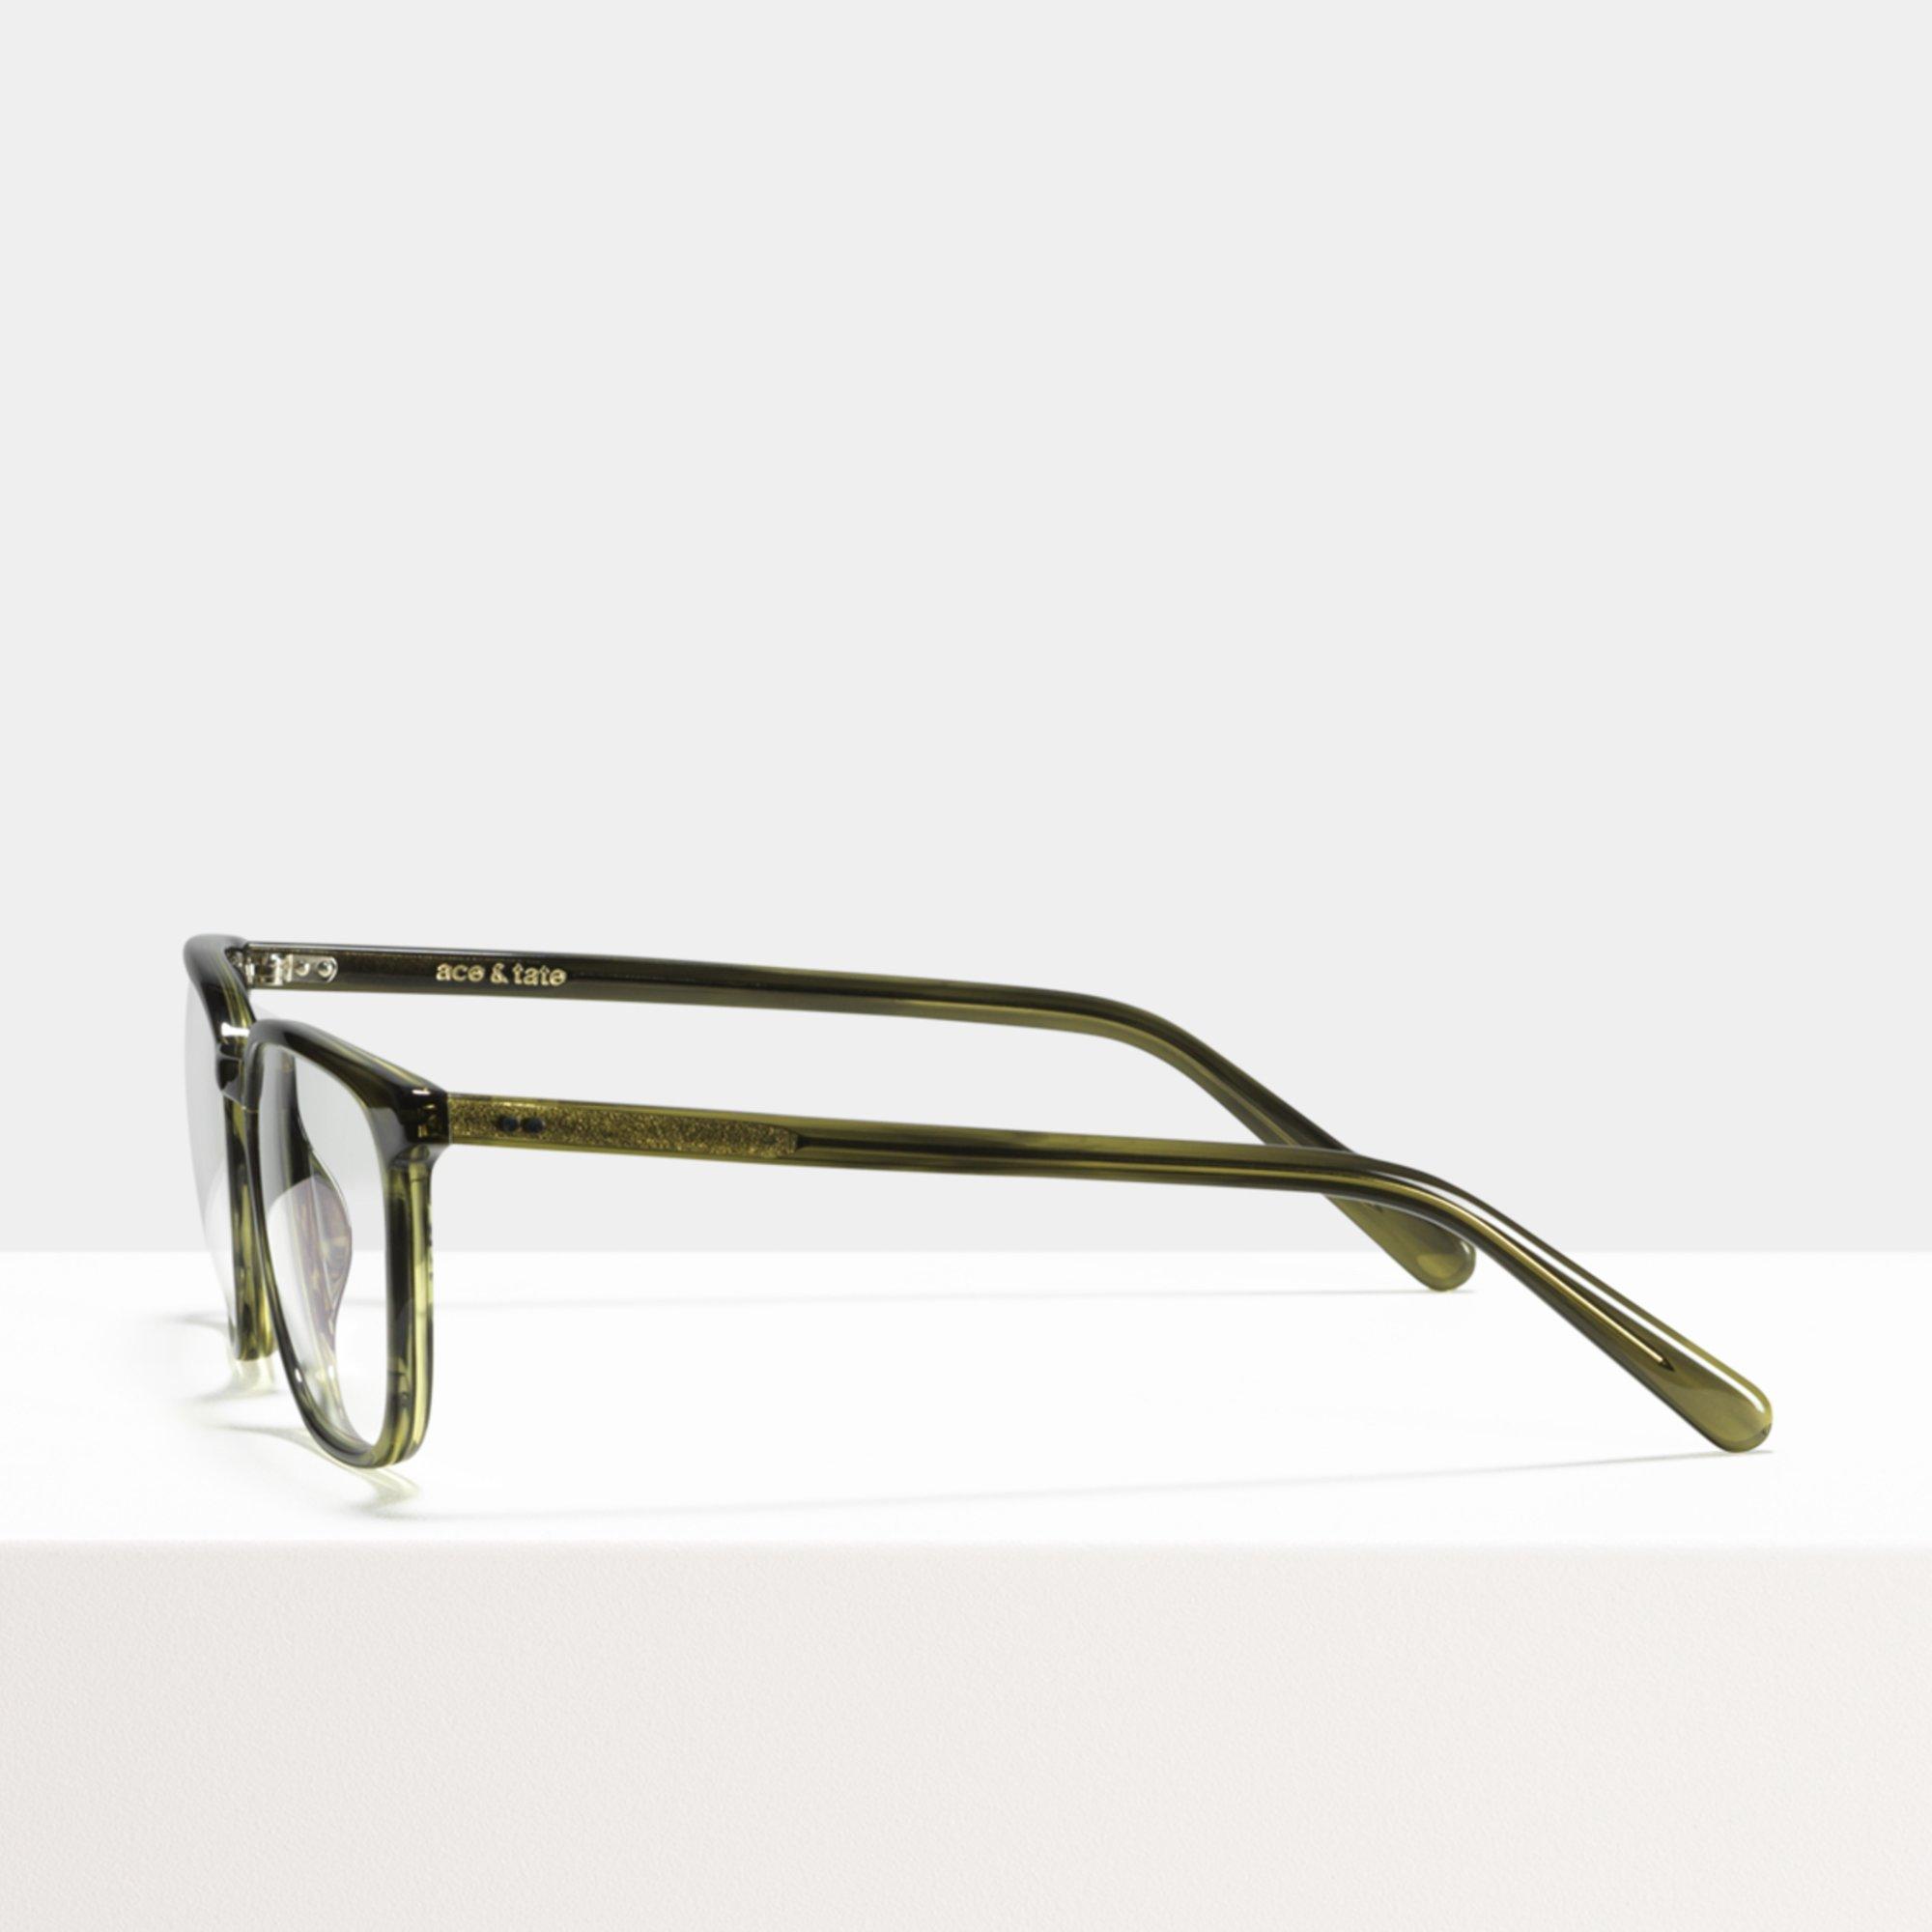 Ace & Tate Glasses | rechteckig Acetat in Grün